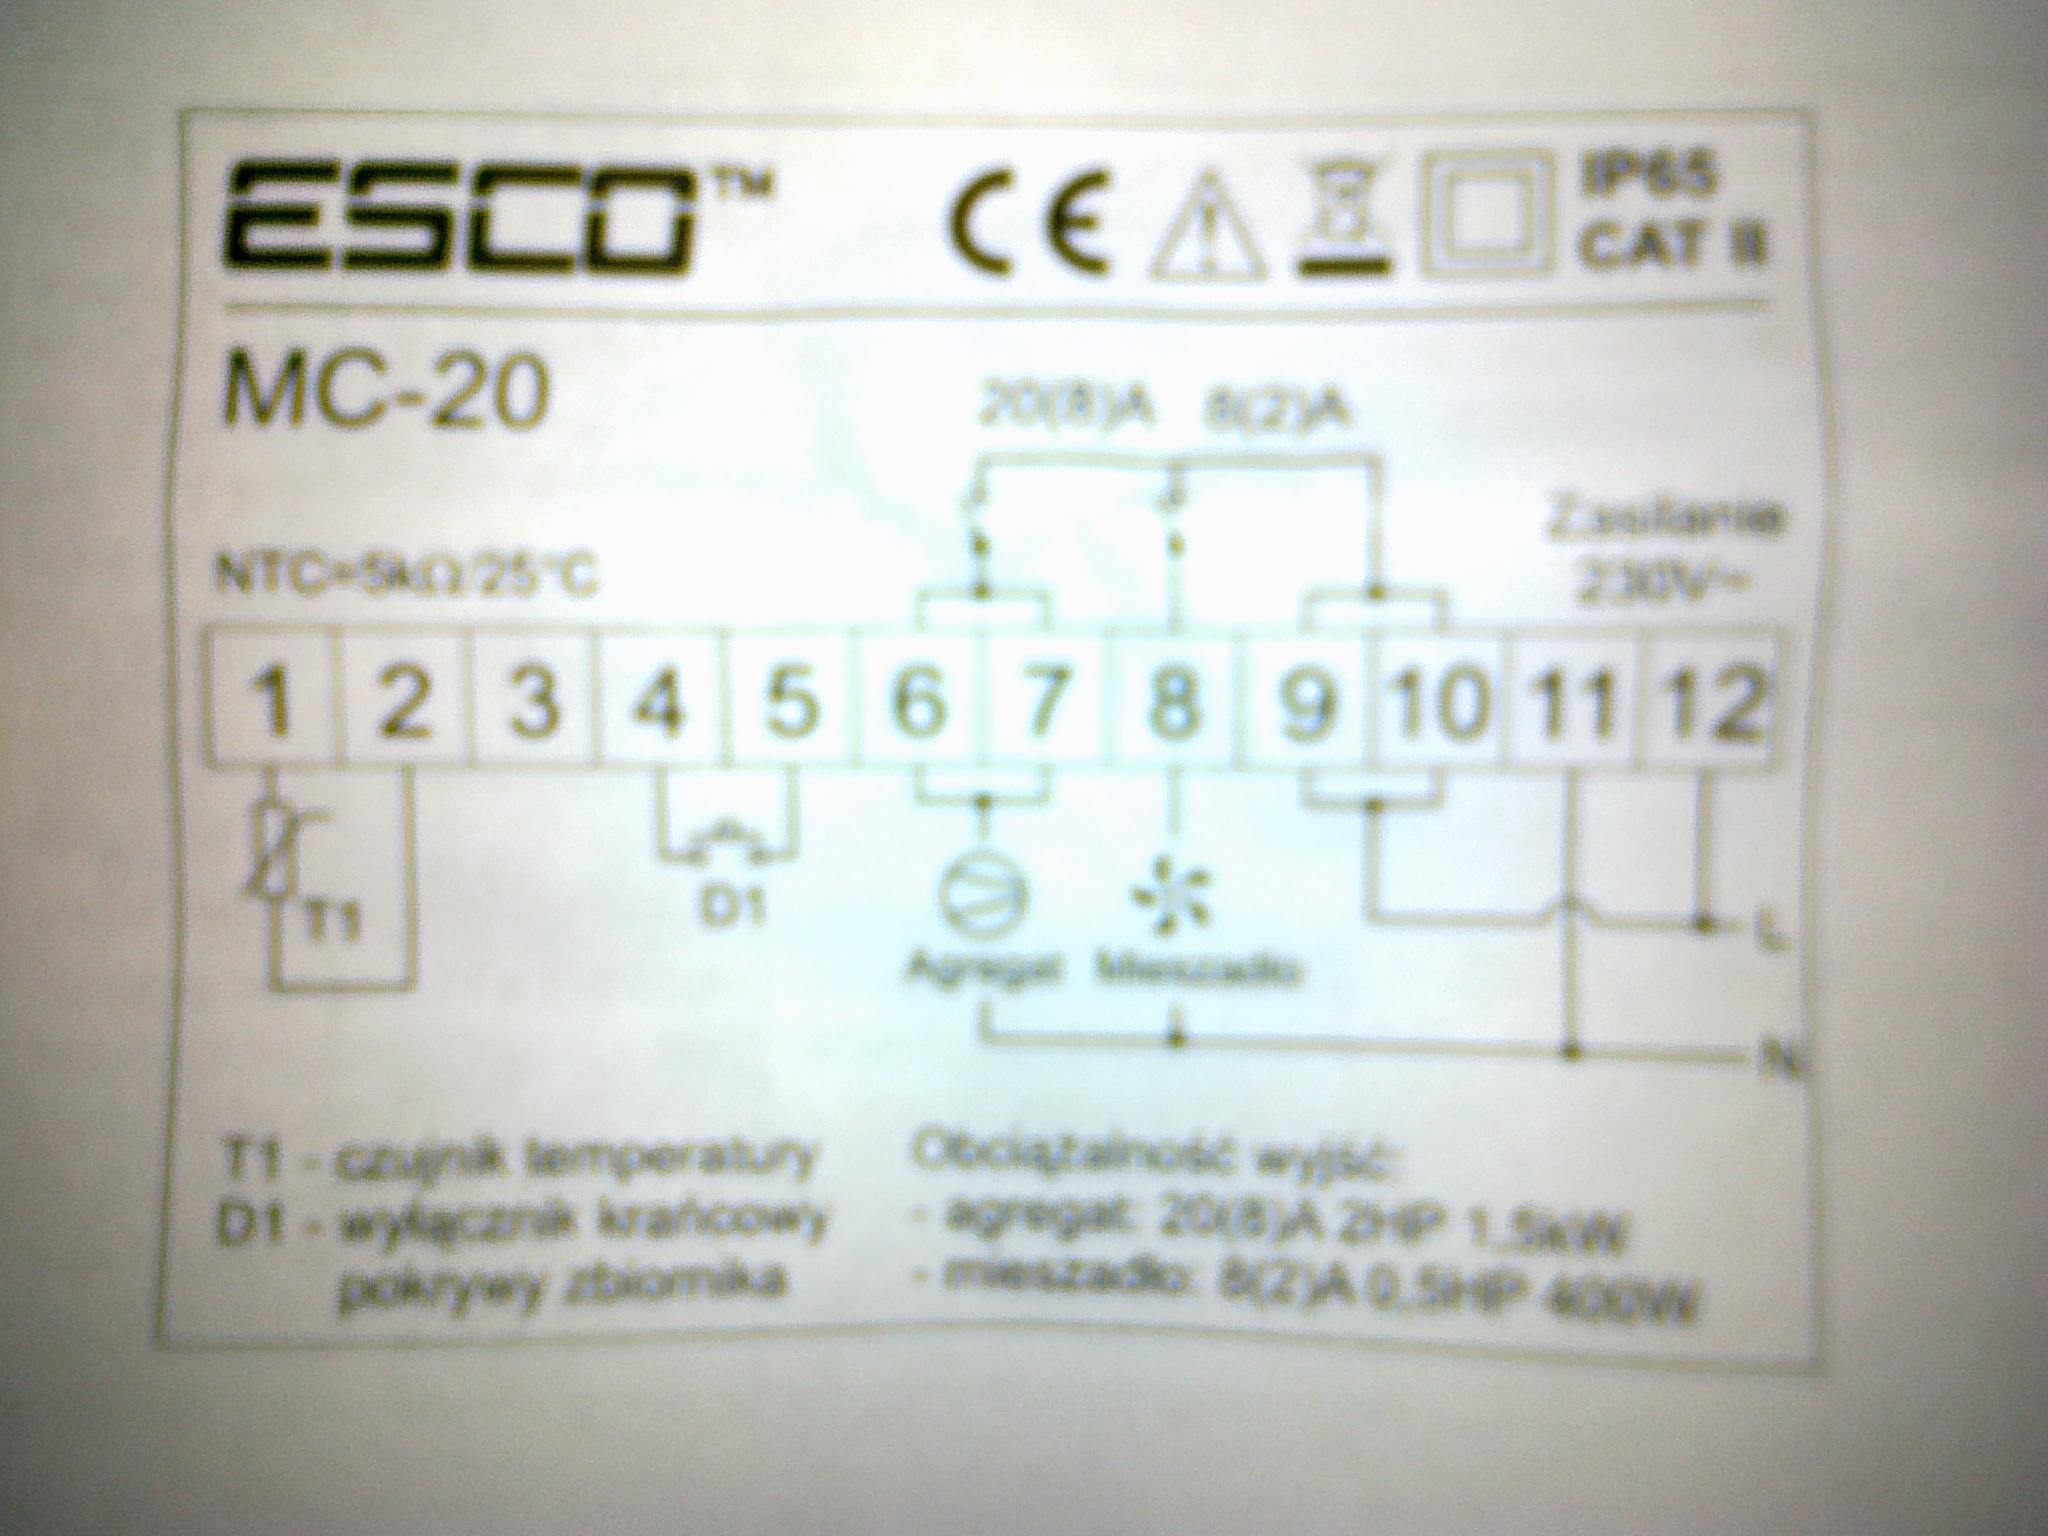 ESCO MC-20 - obja�nienie schematu